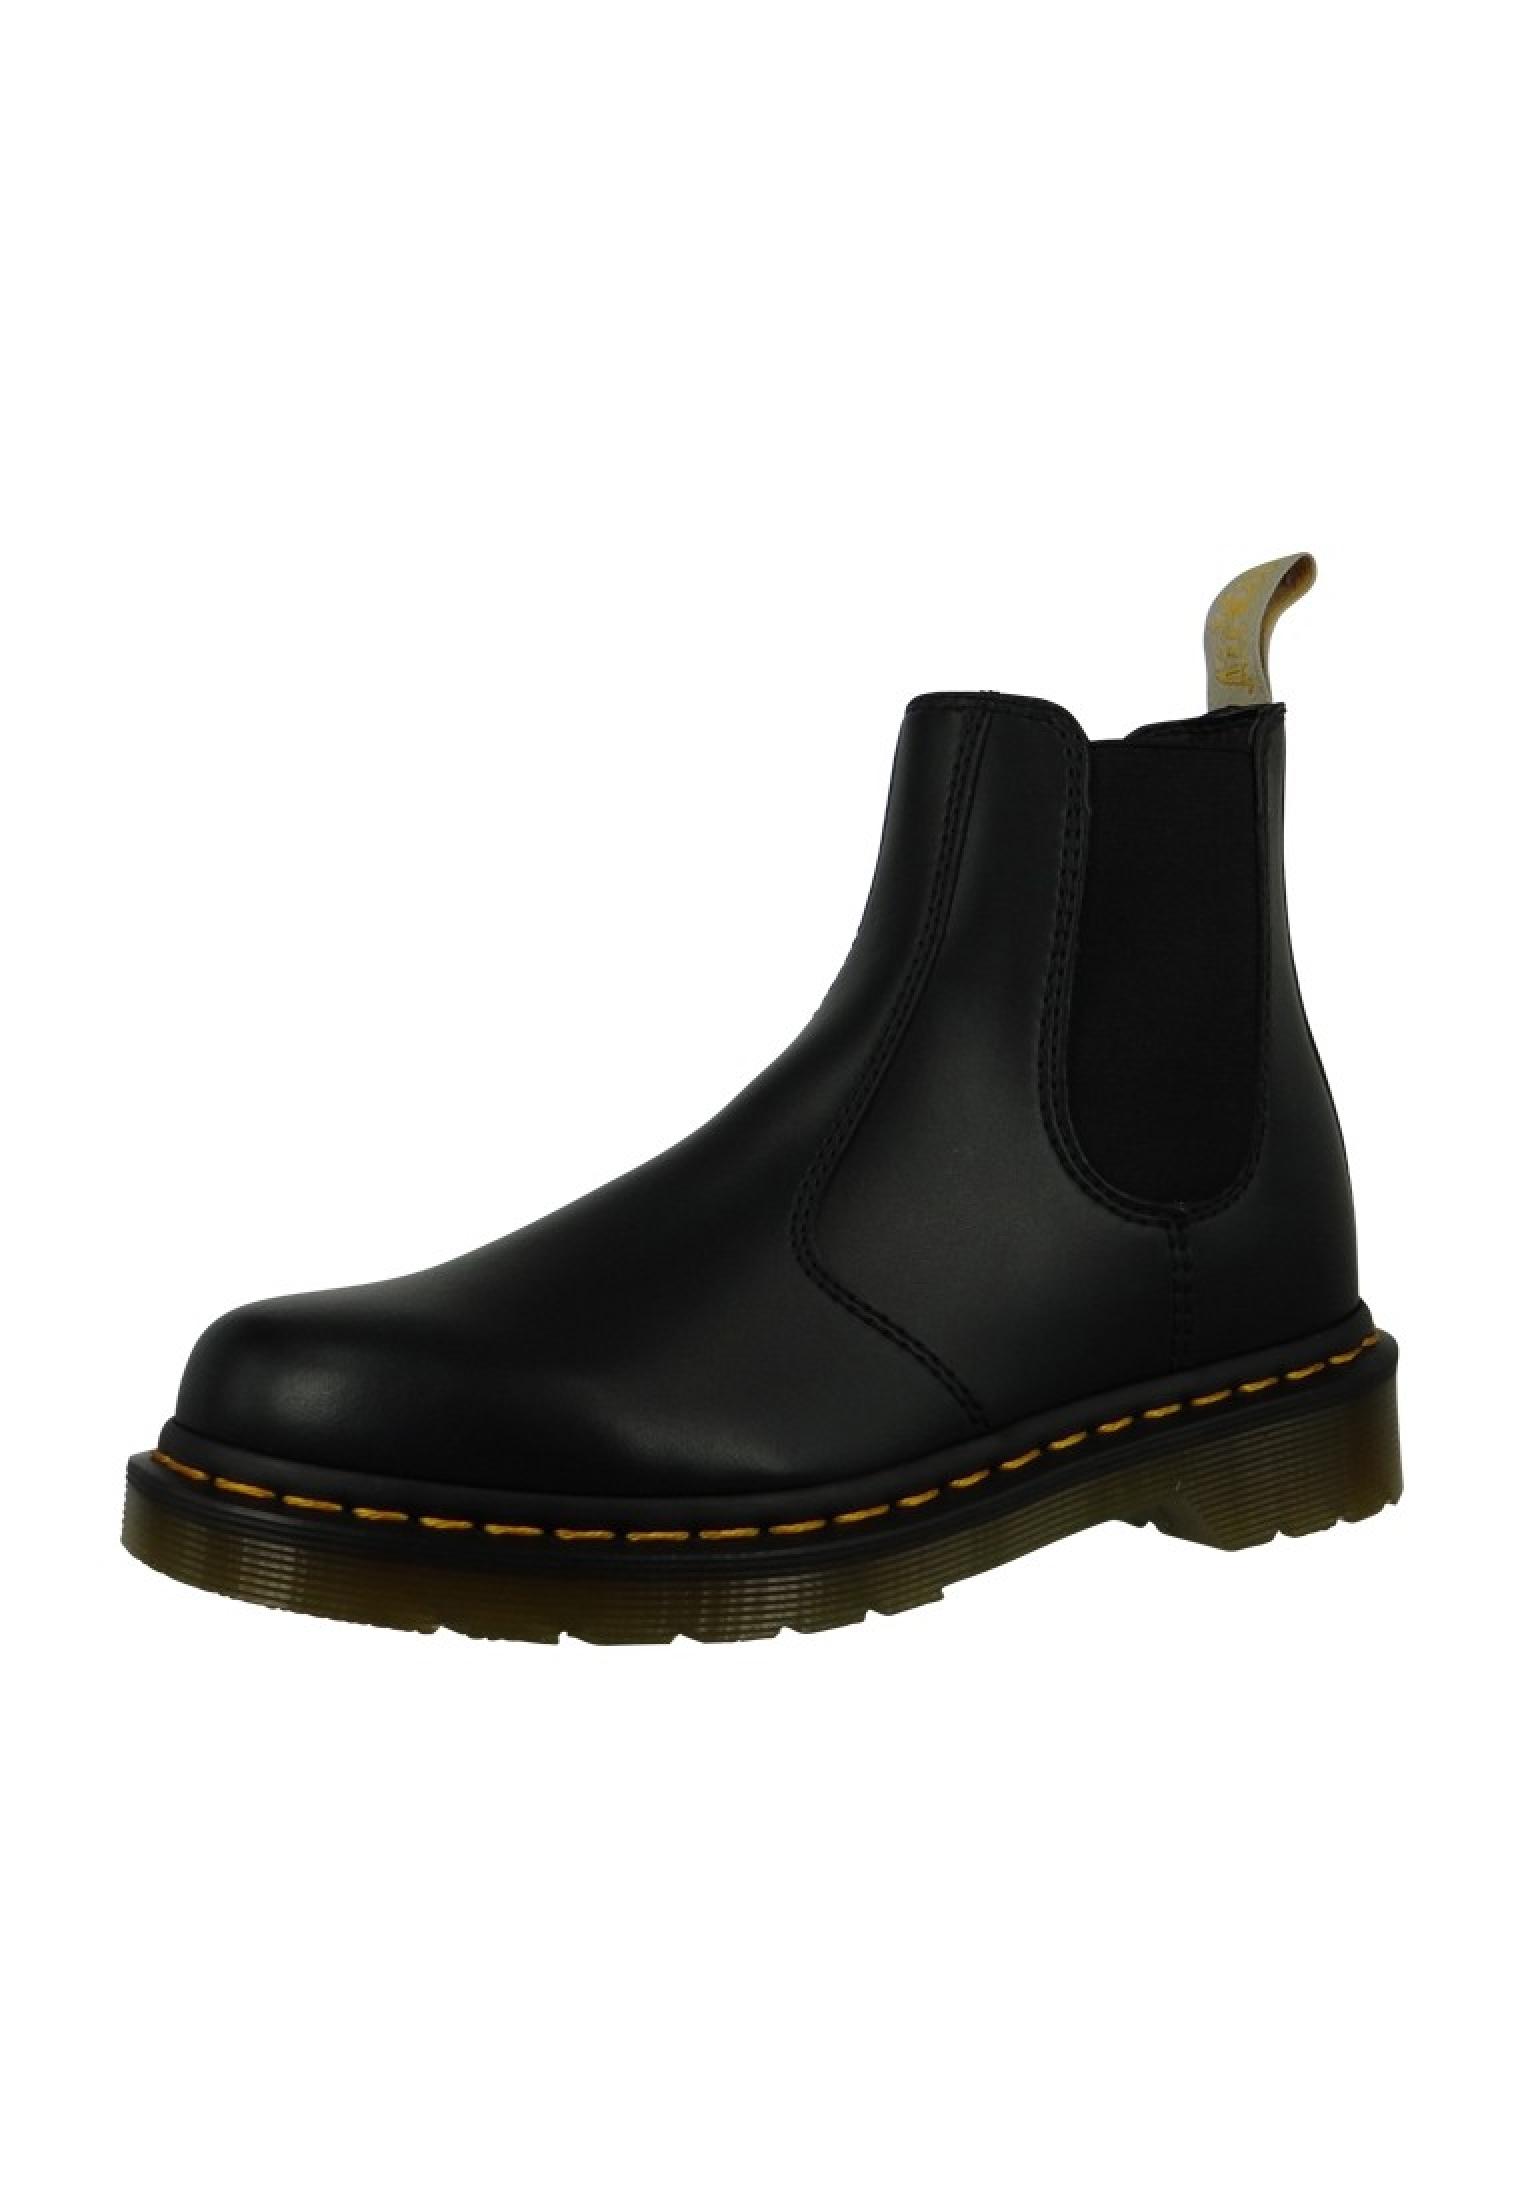 8787a53e06d4da Dr. Martens 2976 21456001 Damen Black Felix Rub Off Schwarz Vegan Chelsea  Boot